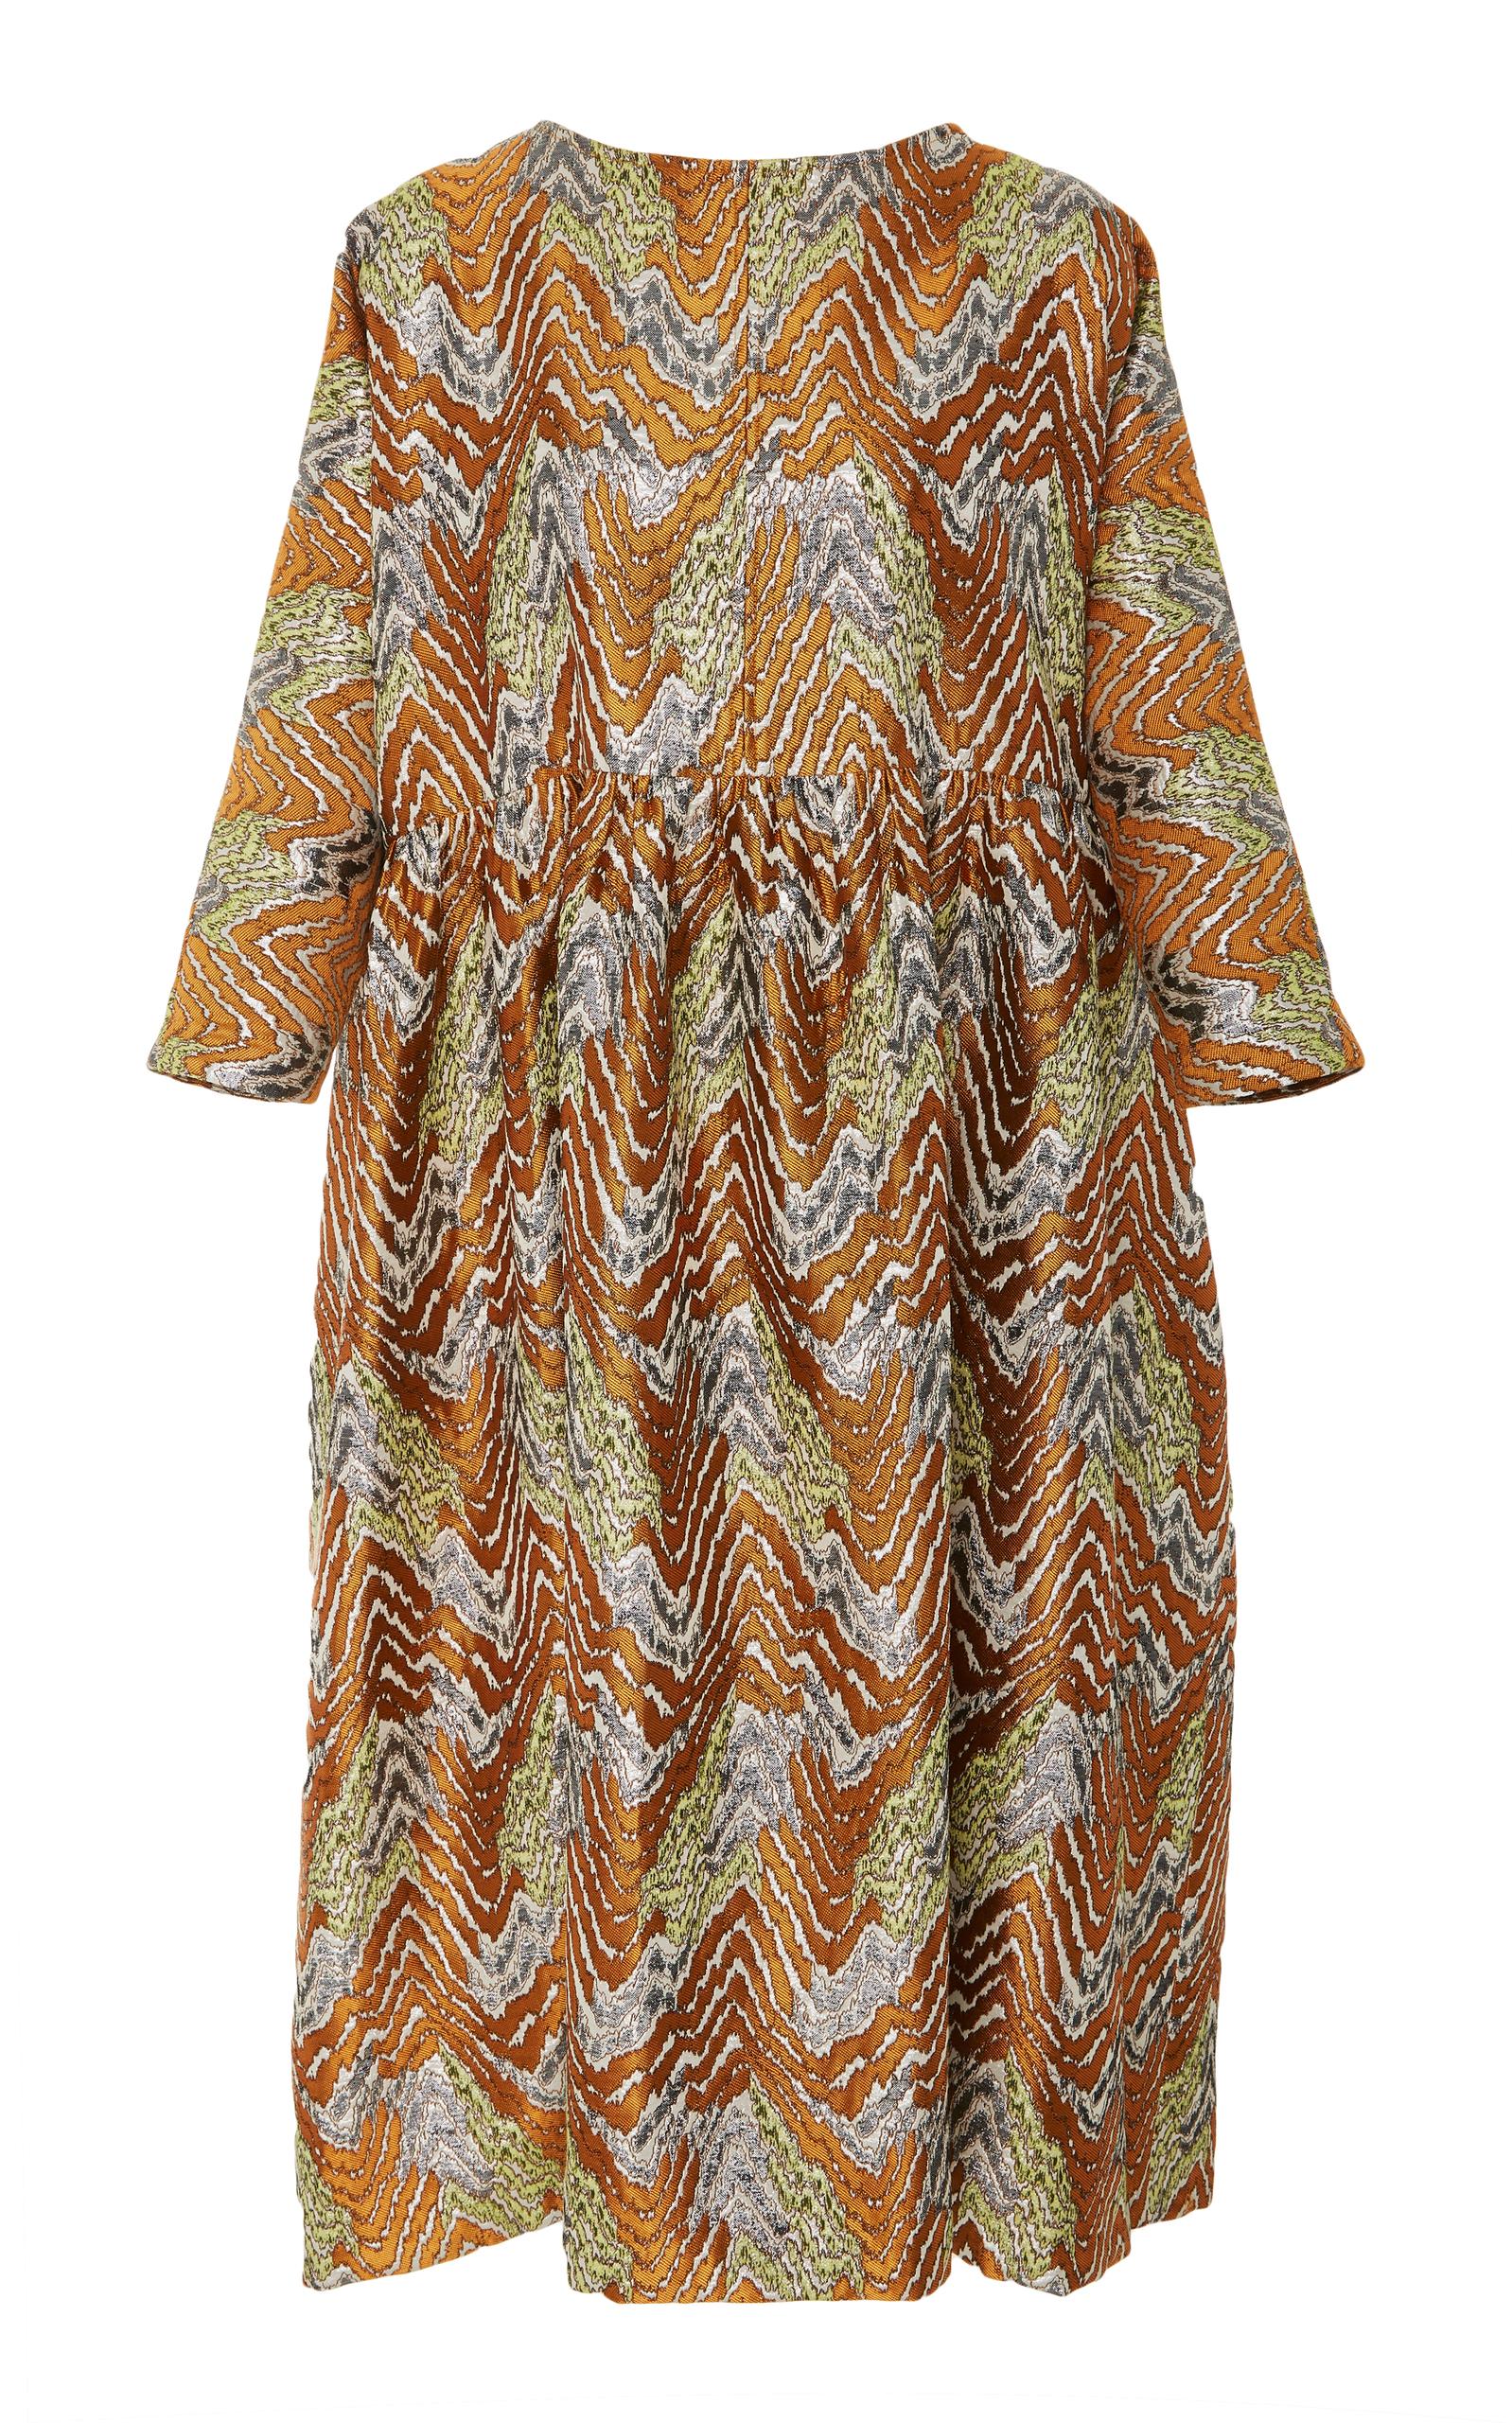 53928abbd1f Rachel ComeyOust Multicolor Jacquard Dress. CLOSE. Loading